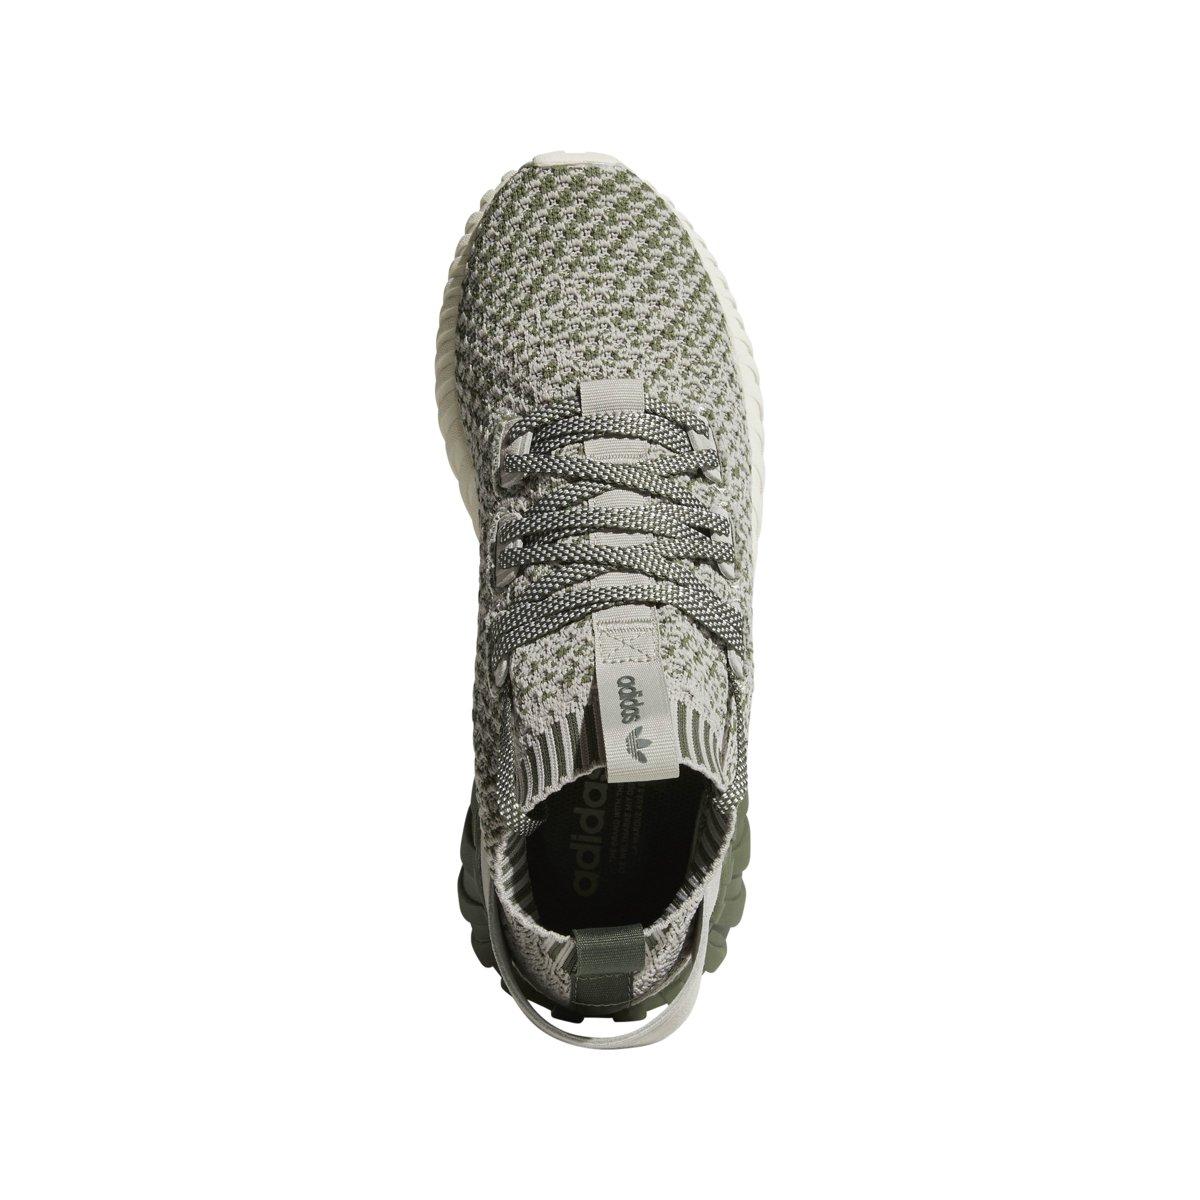 low priced ba0e0 52949 adidas Originals Men's Tubular Doom Sock Primeknit Shoes CQ0945,Size 7.5